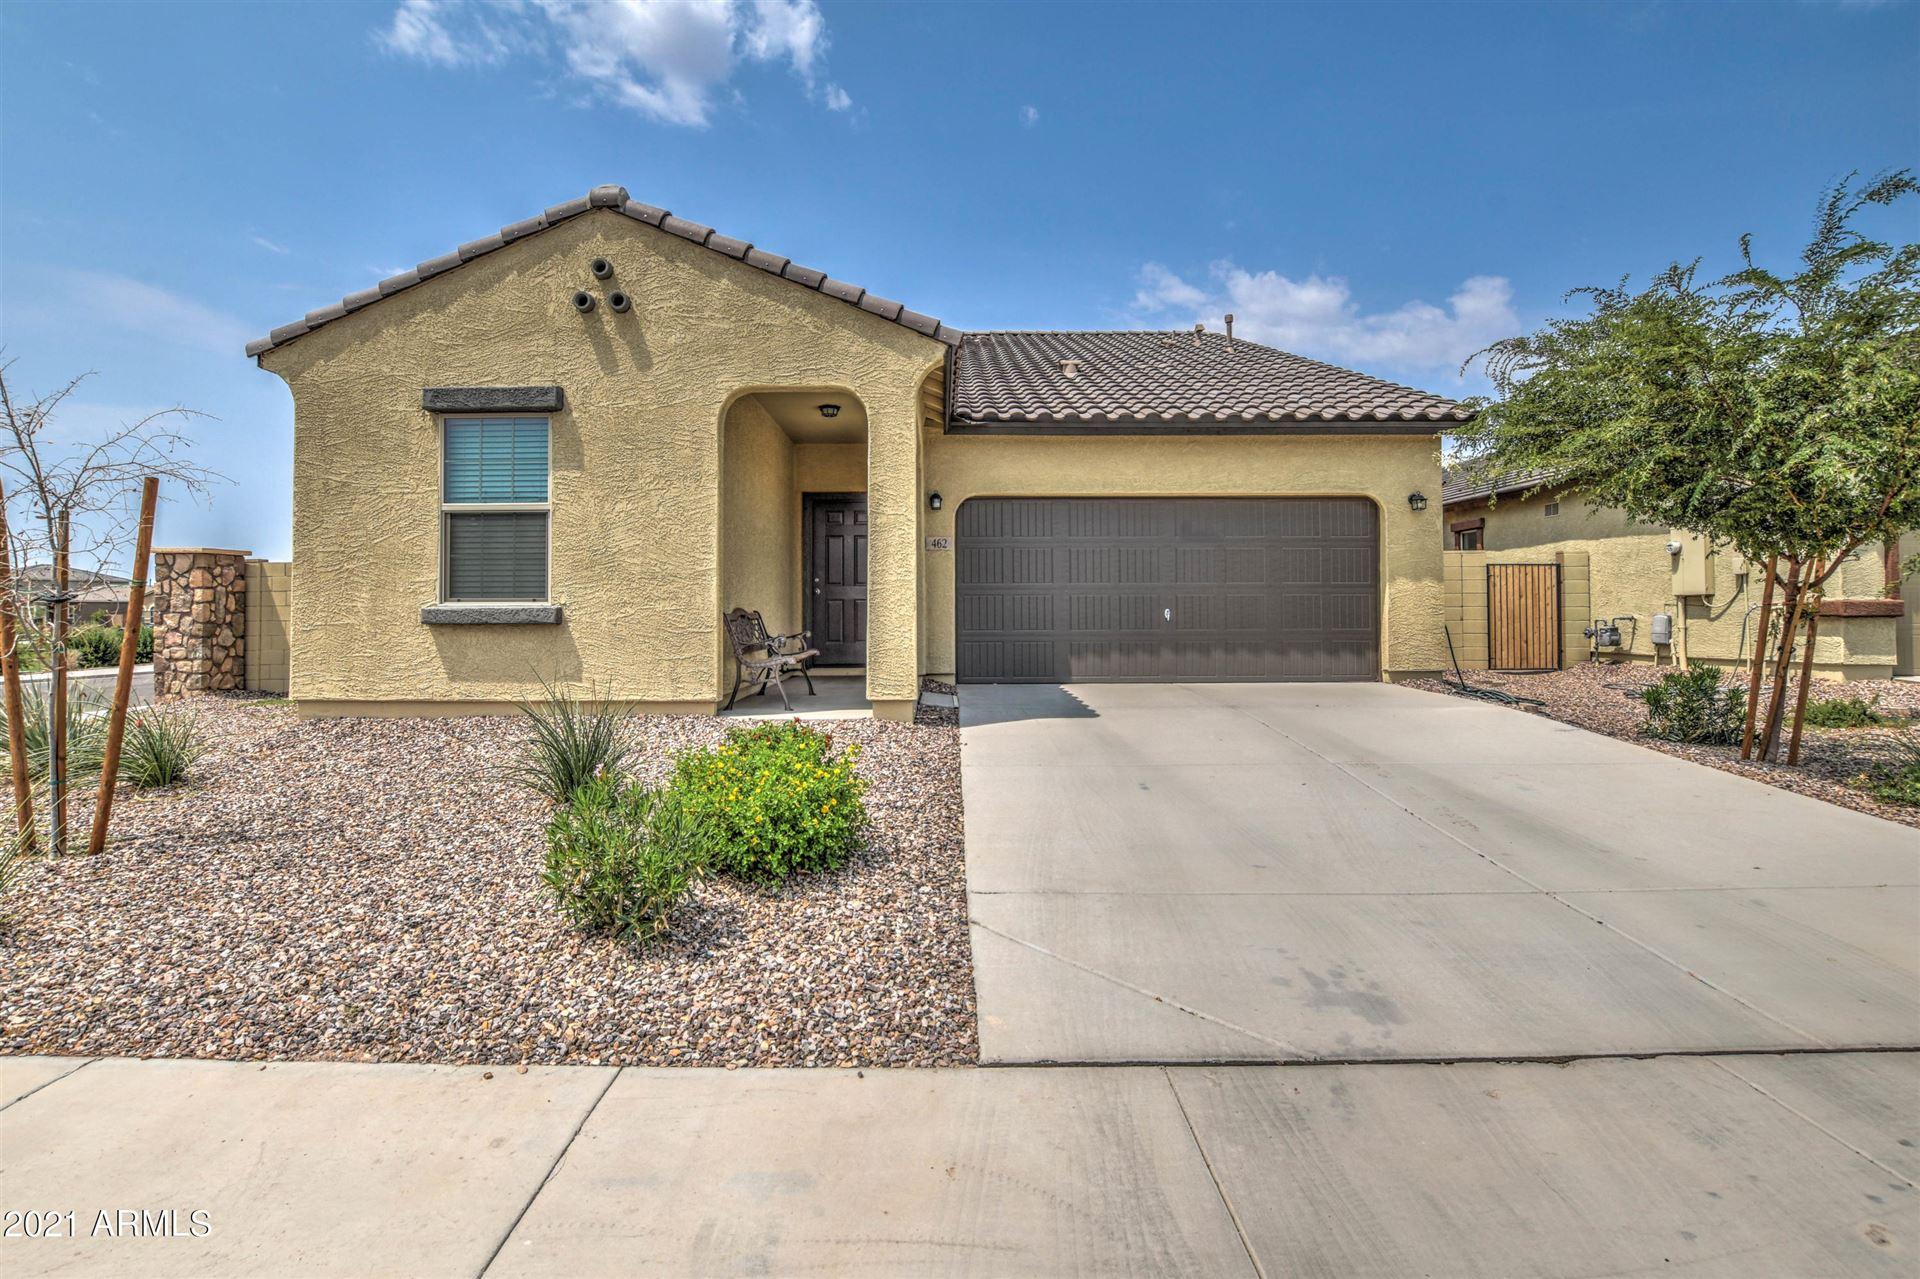 Photo of 462 W Powell Drive, San Tan Valley, AZ 85140 (MLS # 6268909)